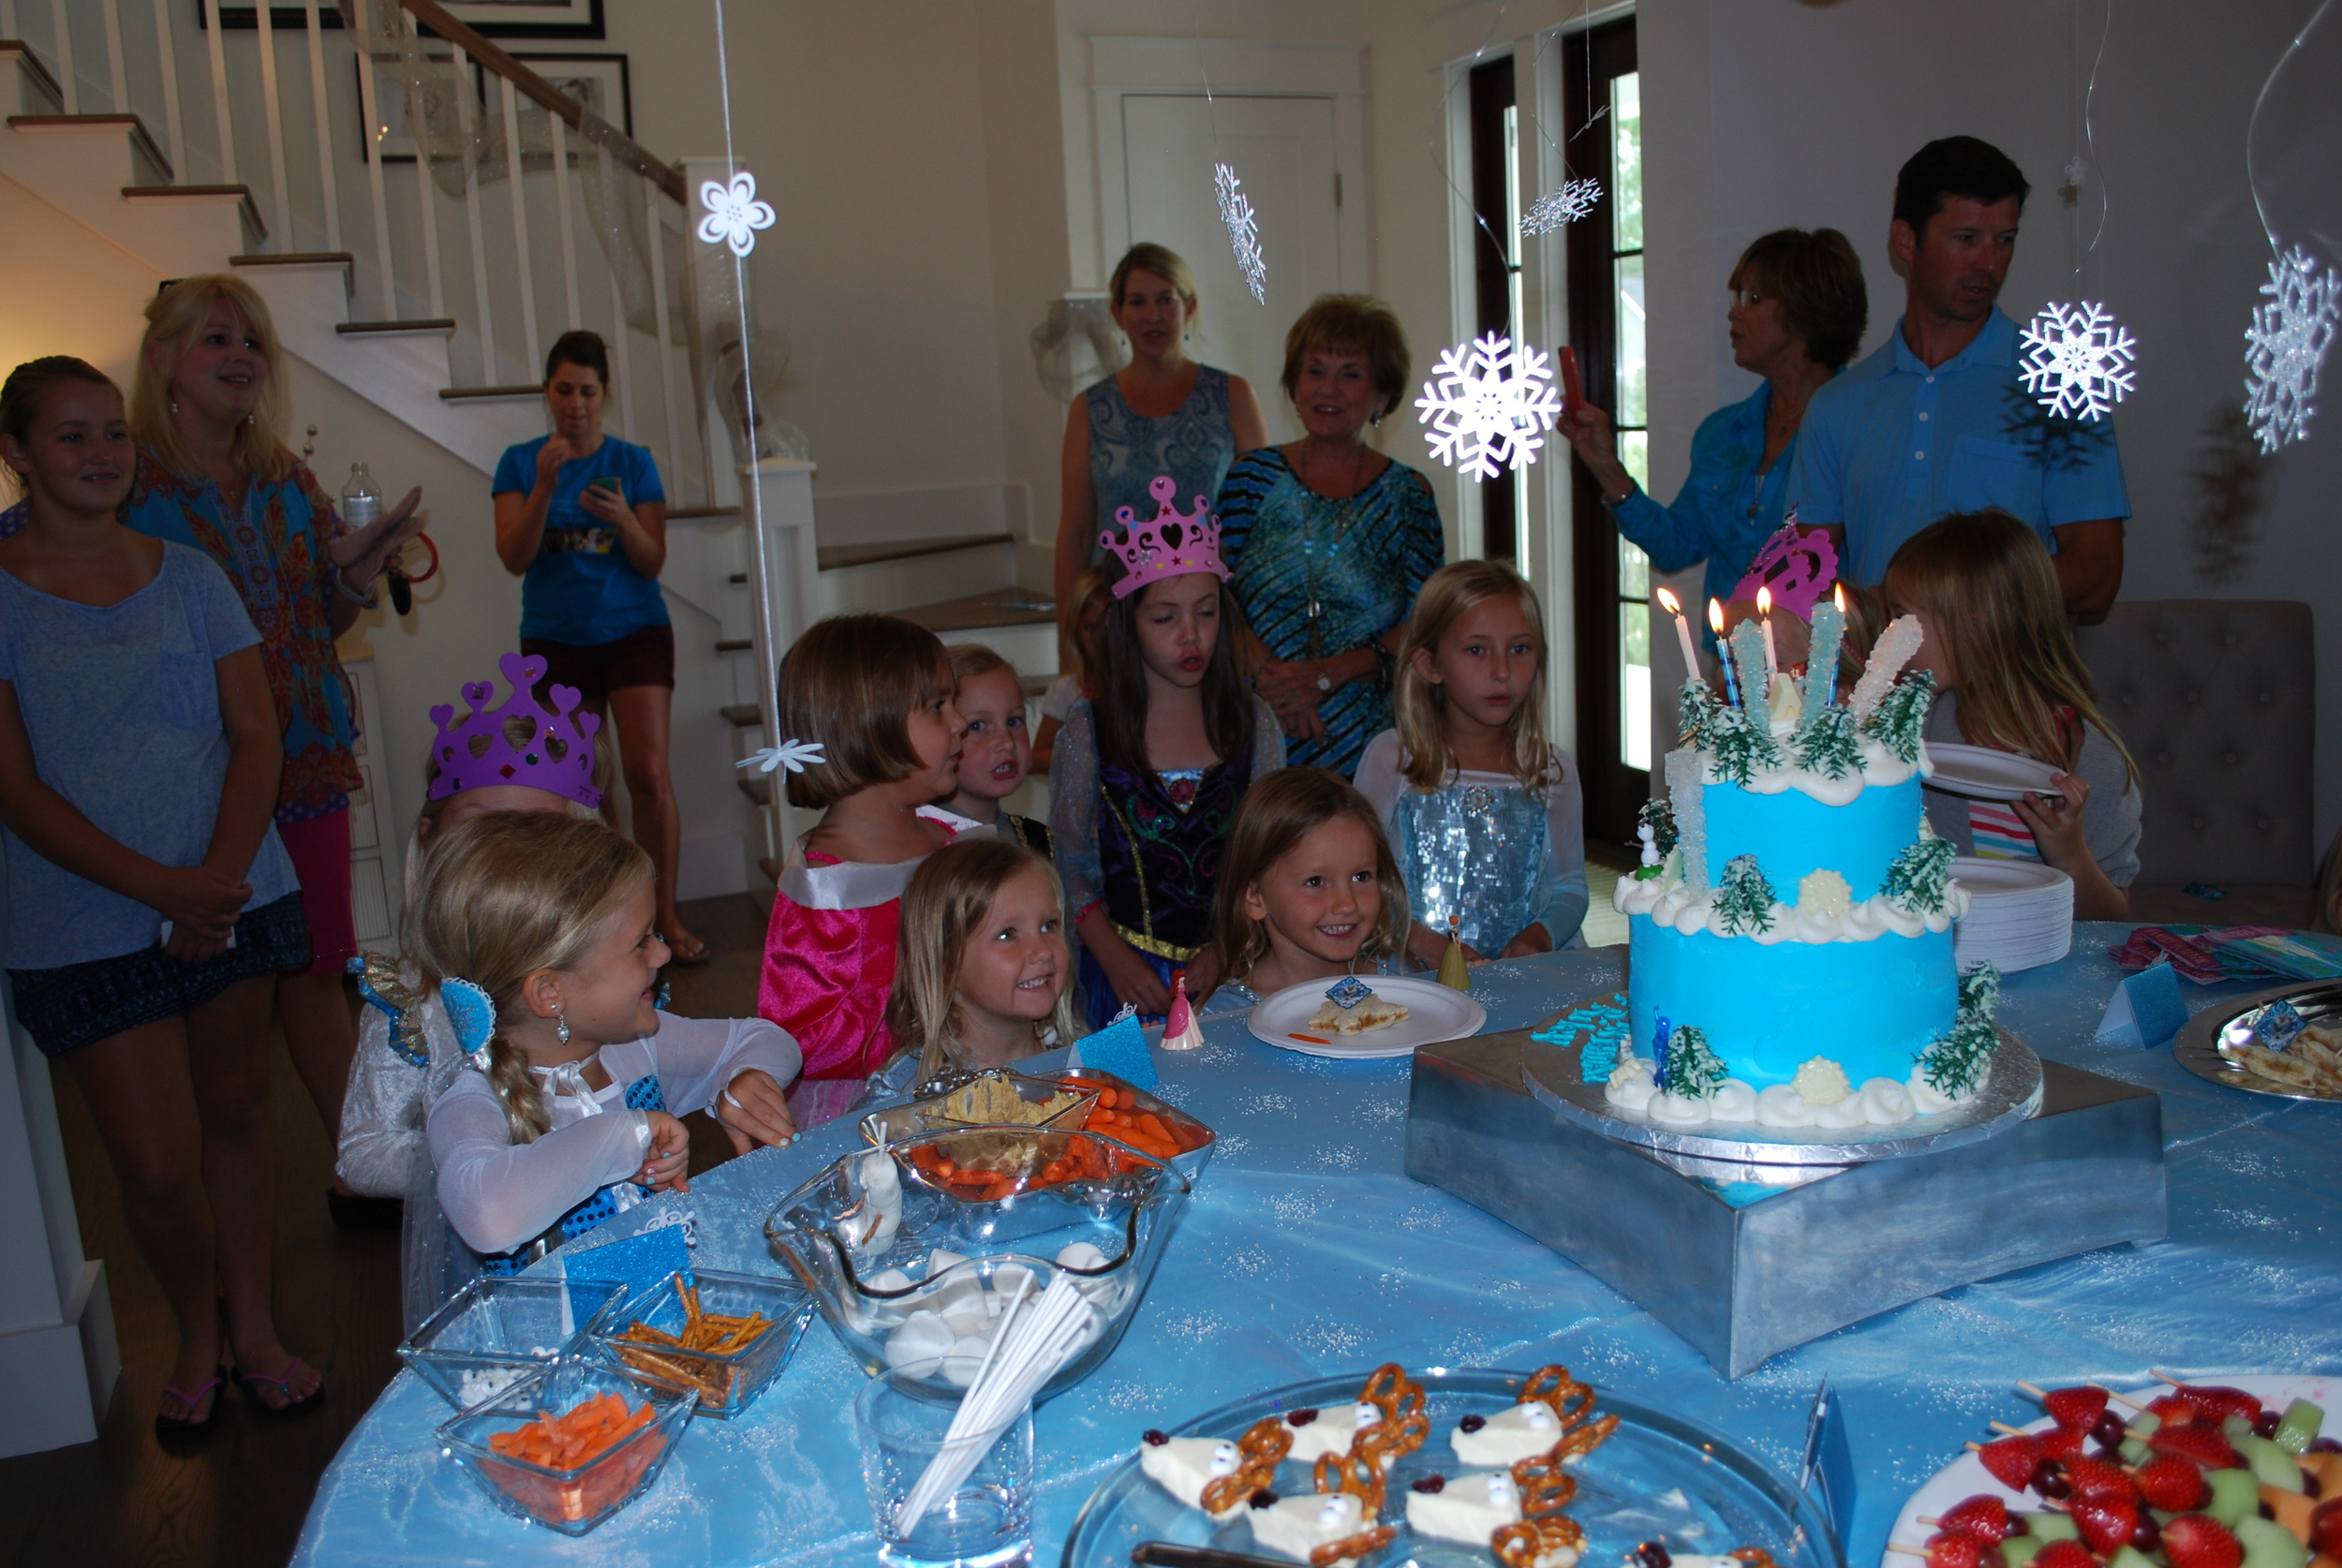 Singing Happy Birthday! The girls' faces melt my heart!